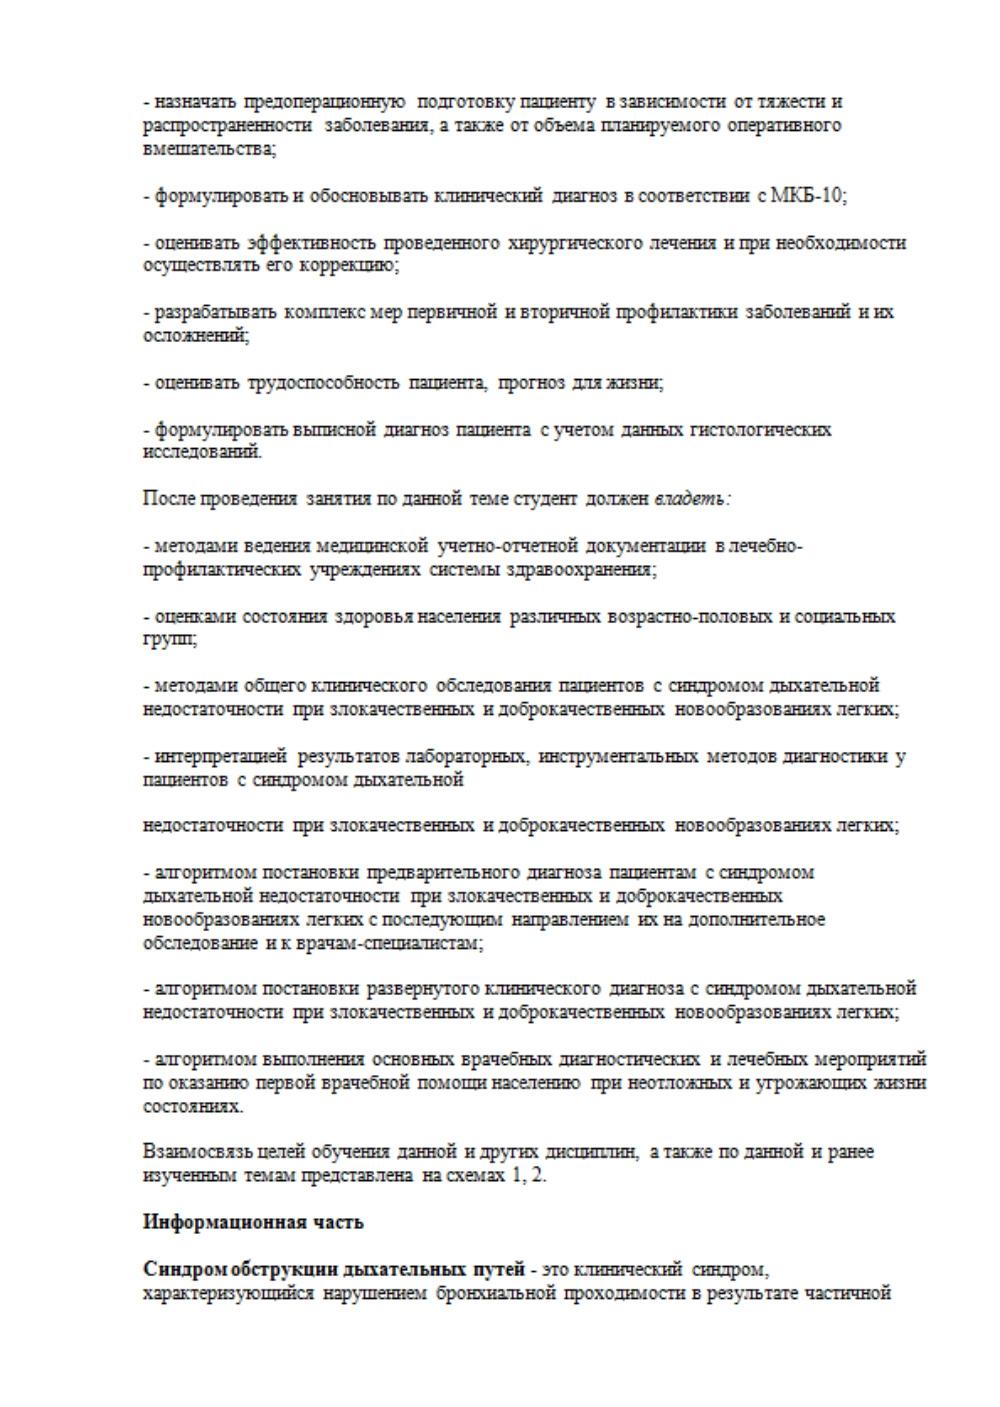 http://ipic.su/img/img7/fs/vO7BlmO7.1591512618.jpg